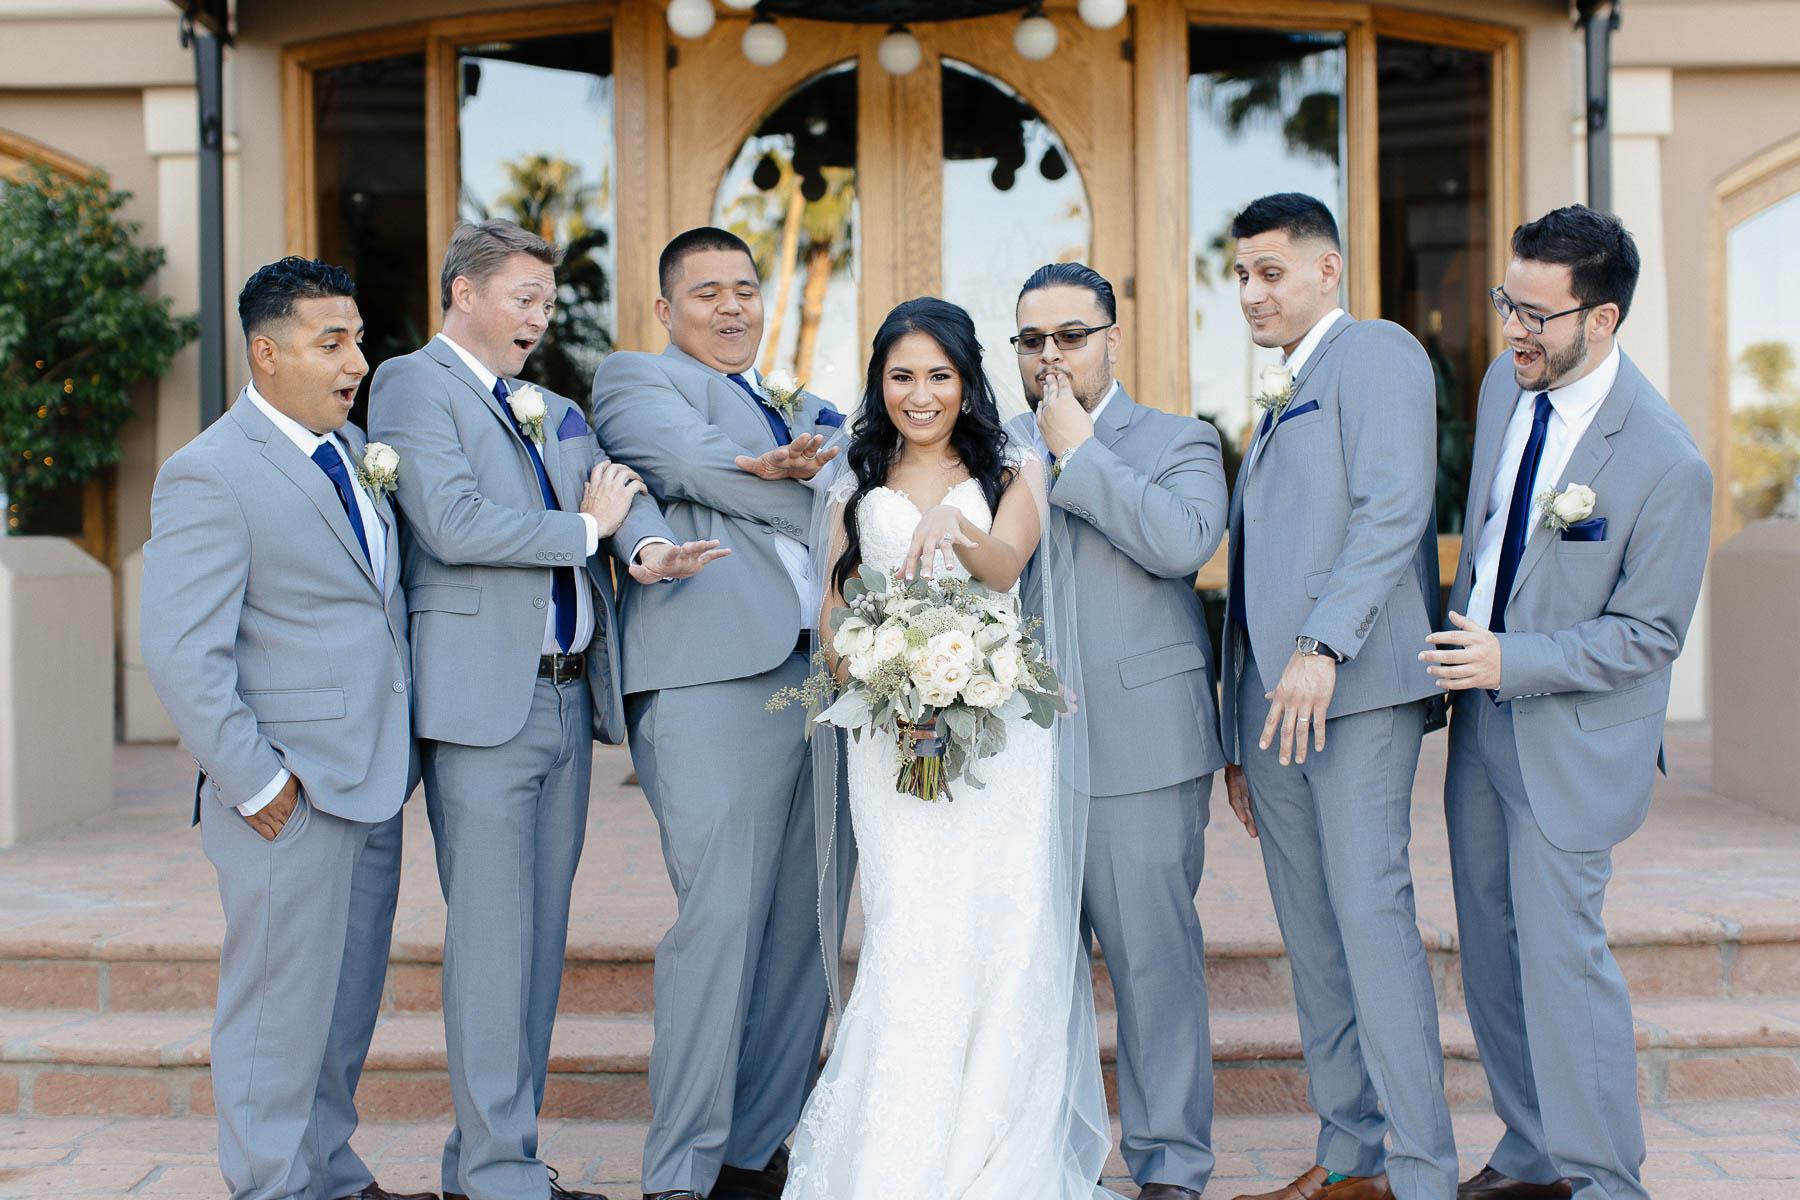 161029-Luxium-Weddings-Arizona-Jeff-Griselda-First-Look-Val-Vista-Lakes-Gilber-045.jpg